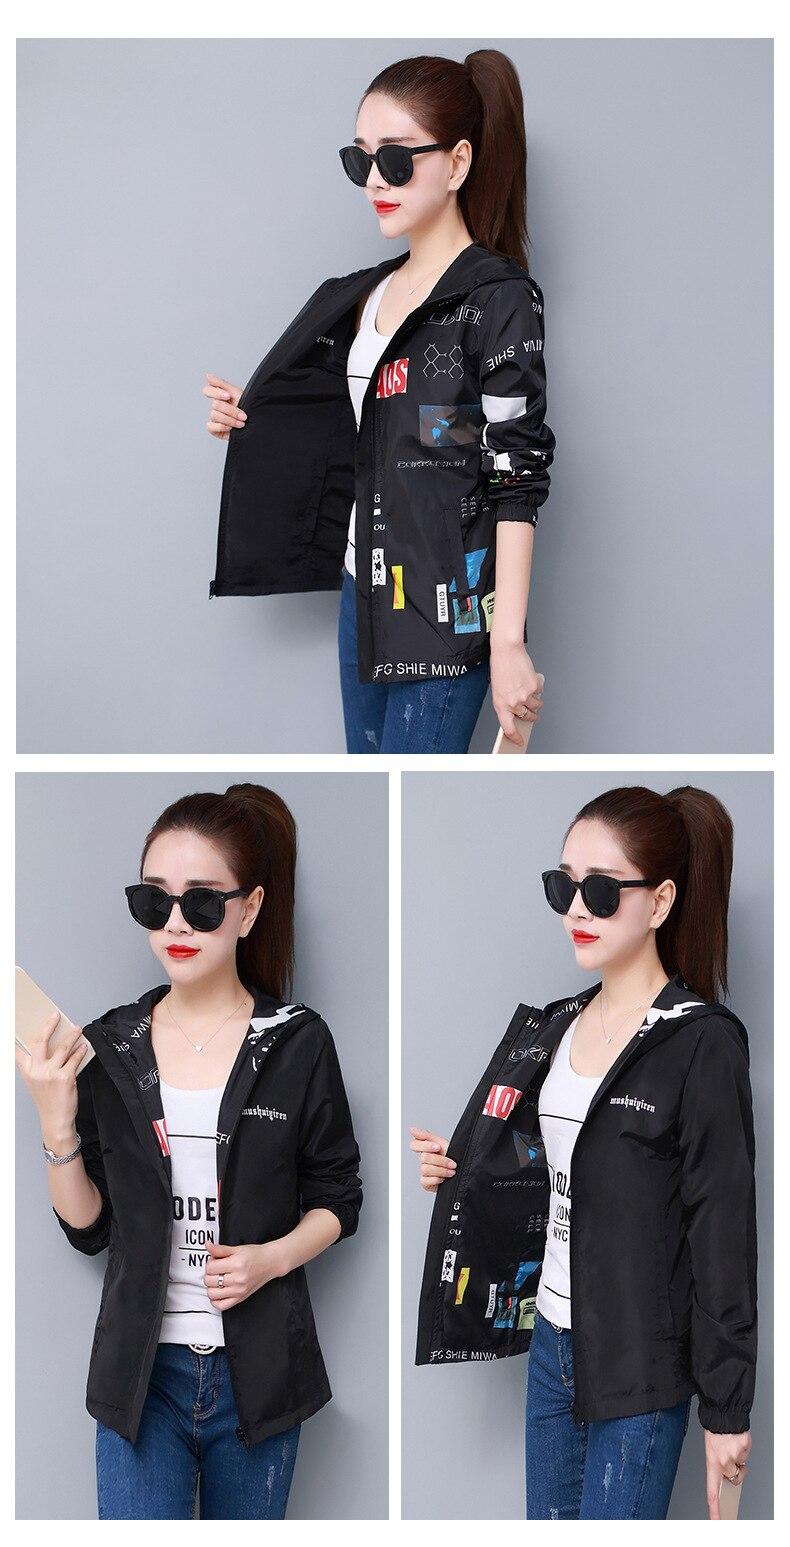 Hdde19da6e44d4e39abfa5b65208159dcm Streetwear Hooded Printed jacket women And Causal windbreaker Basic Jackets 2019 New Reversible baseball Zippers jacket 4XL